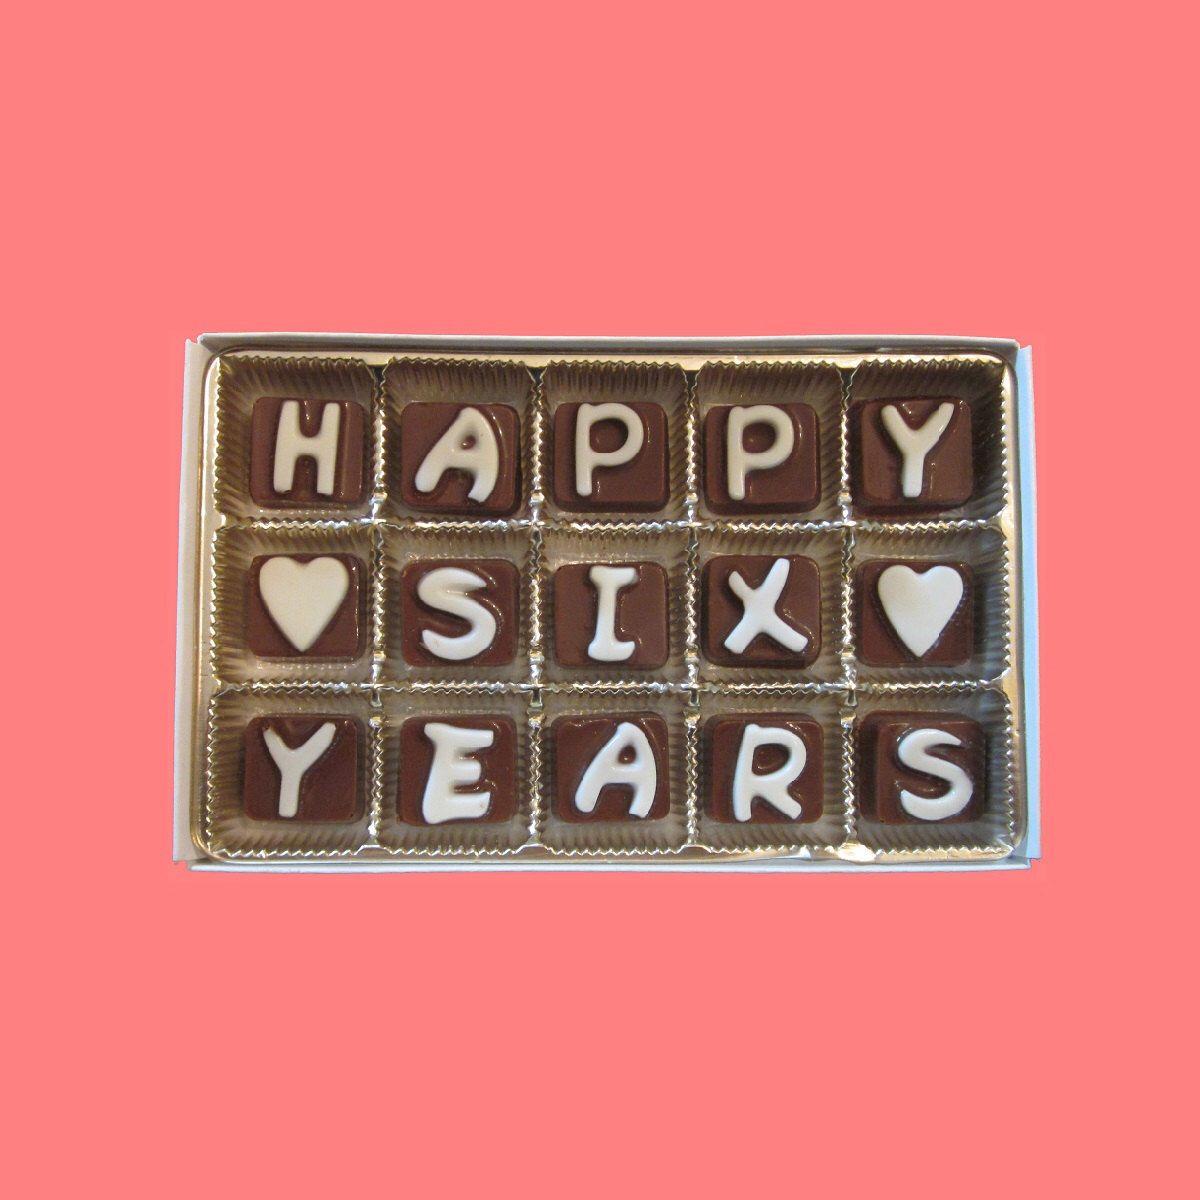 6th Sixth Wedding Anniversary Gift For Men Women Husband Hubby Wife Him Her Hy Six 6